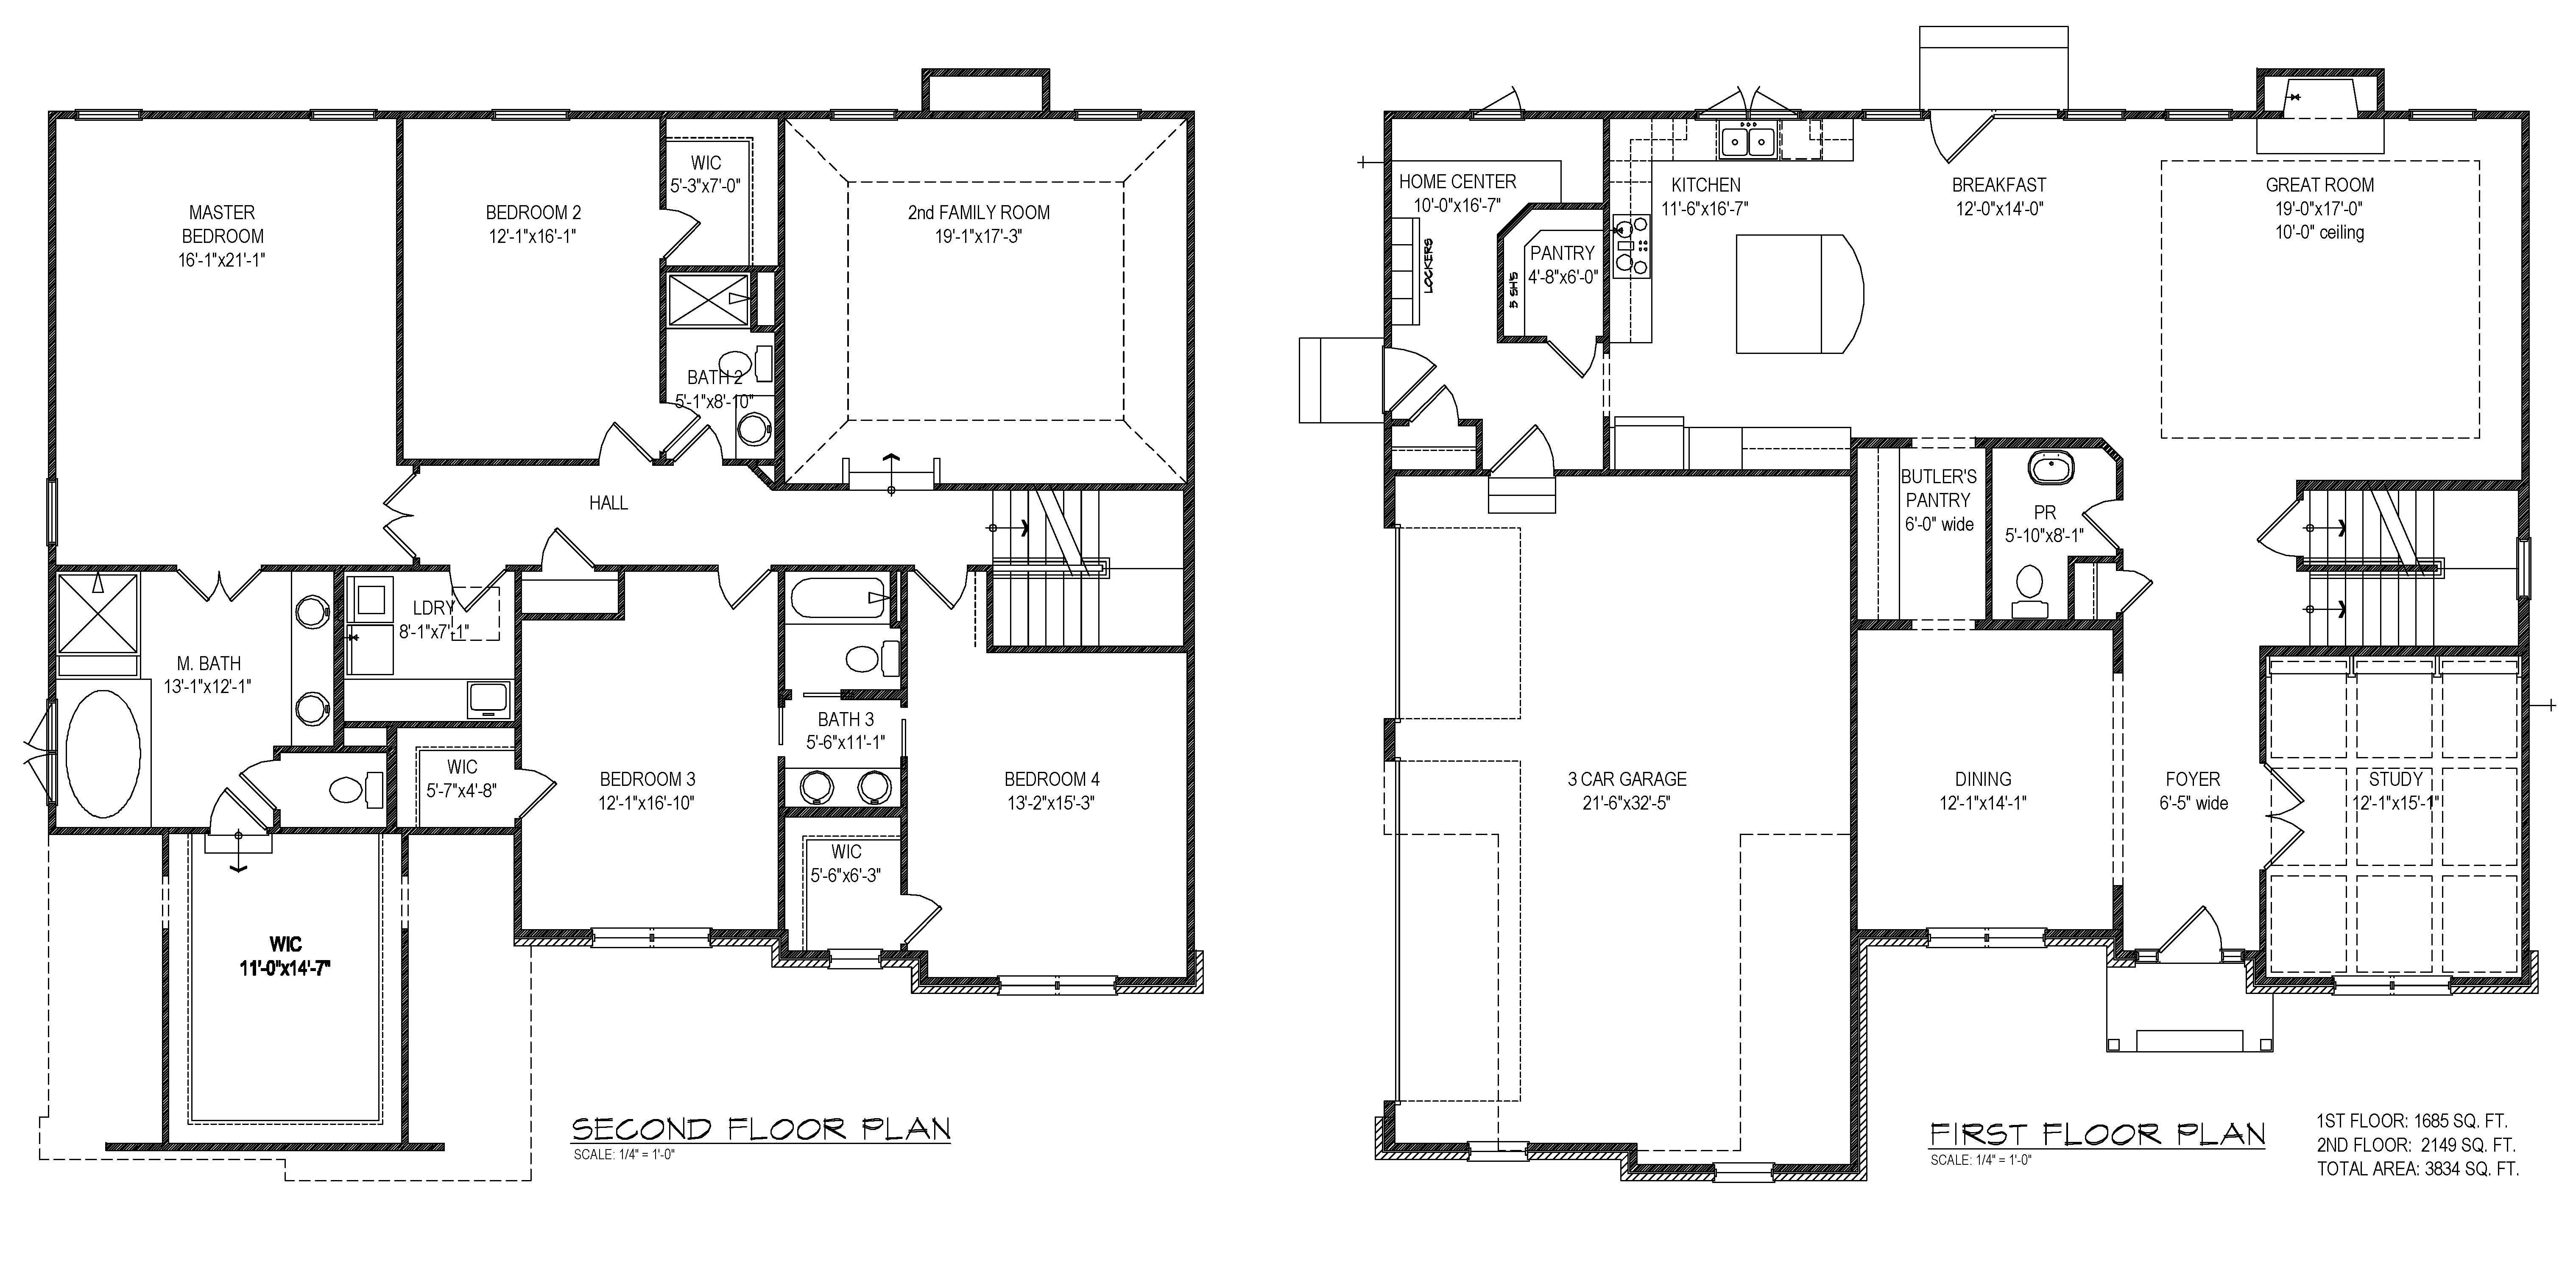 Layout First And Second Floor Plan Walk Closet Design Home